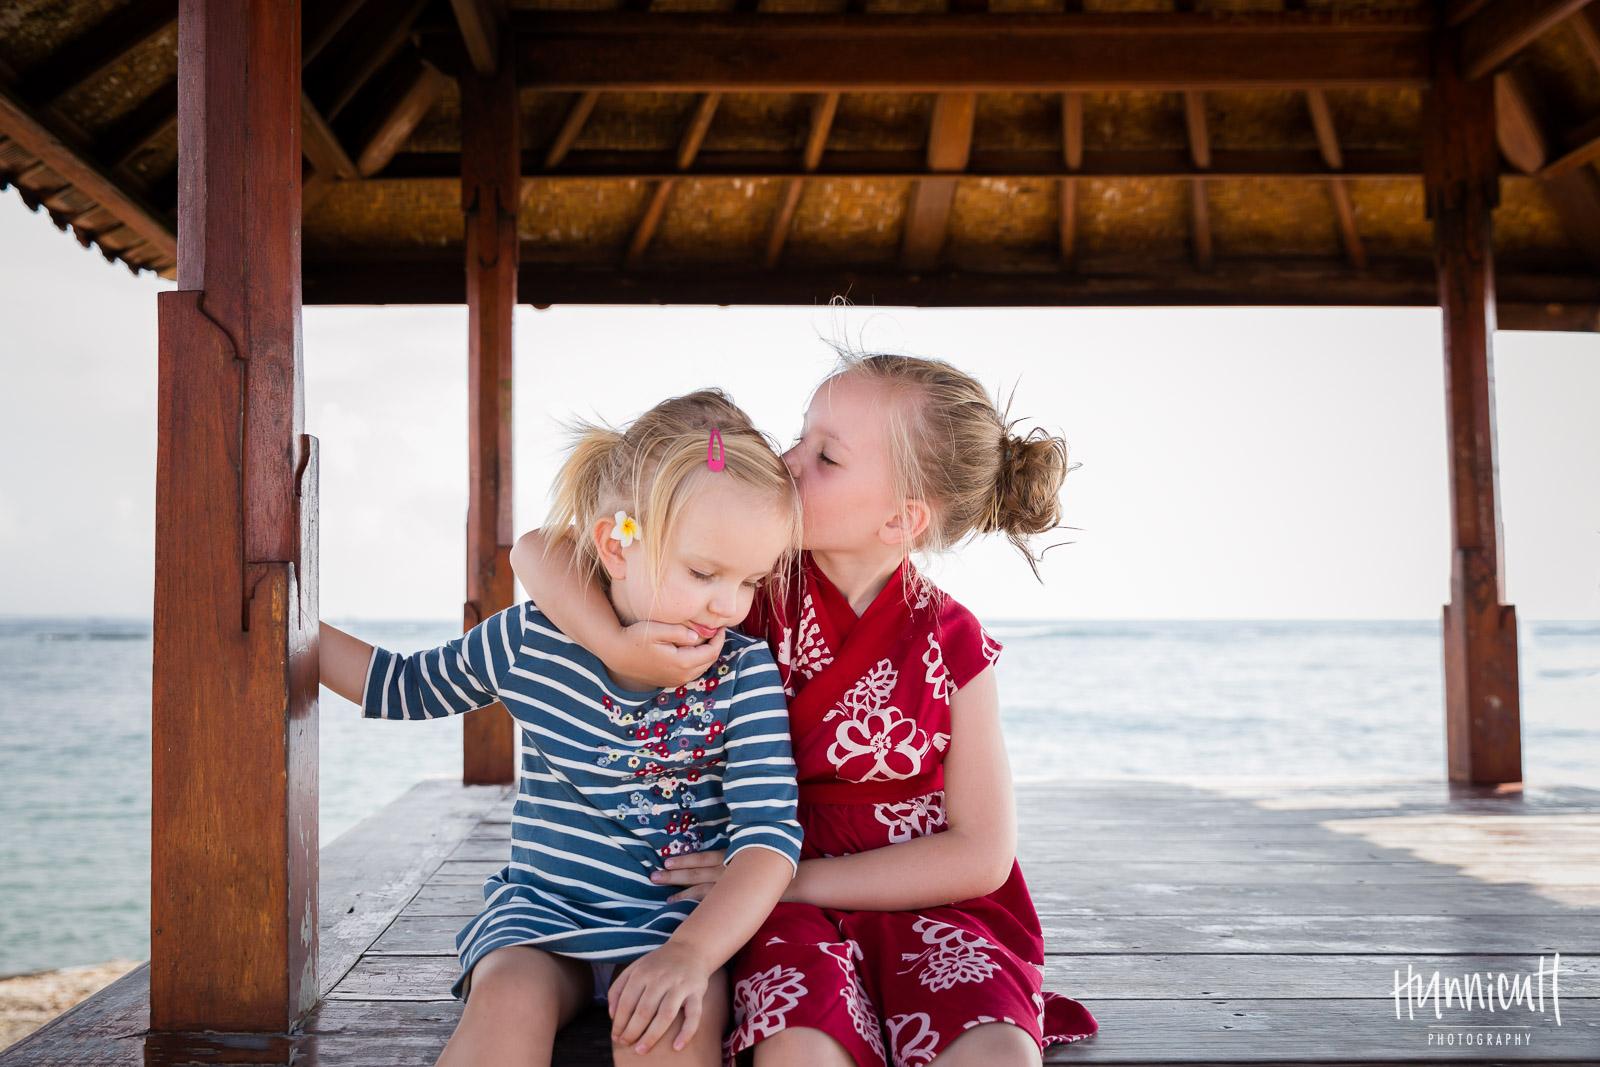 sisters sitting on a dock in Bali hugging by Rebecca Hunnicutt Farren